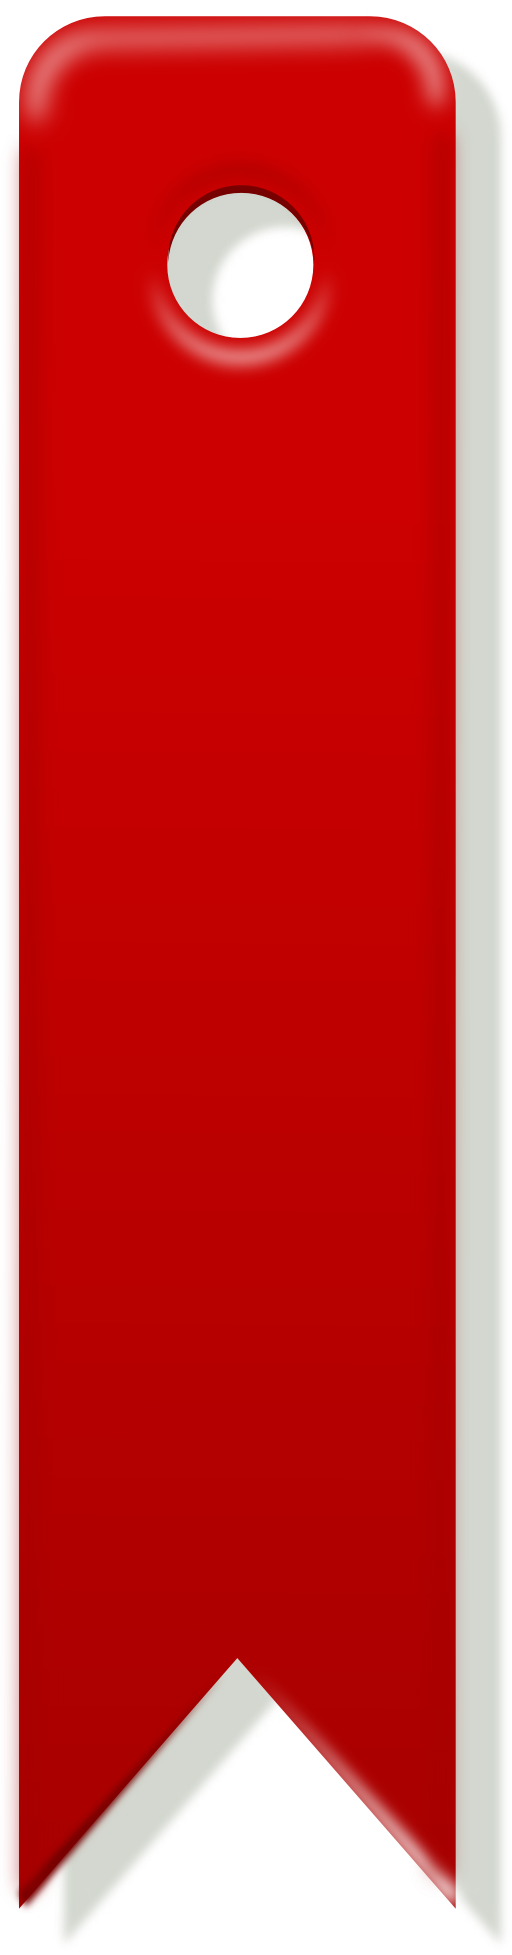 Bookmark clip art.